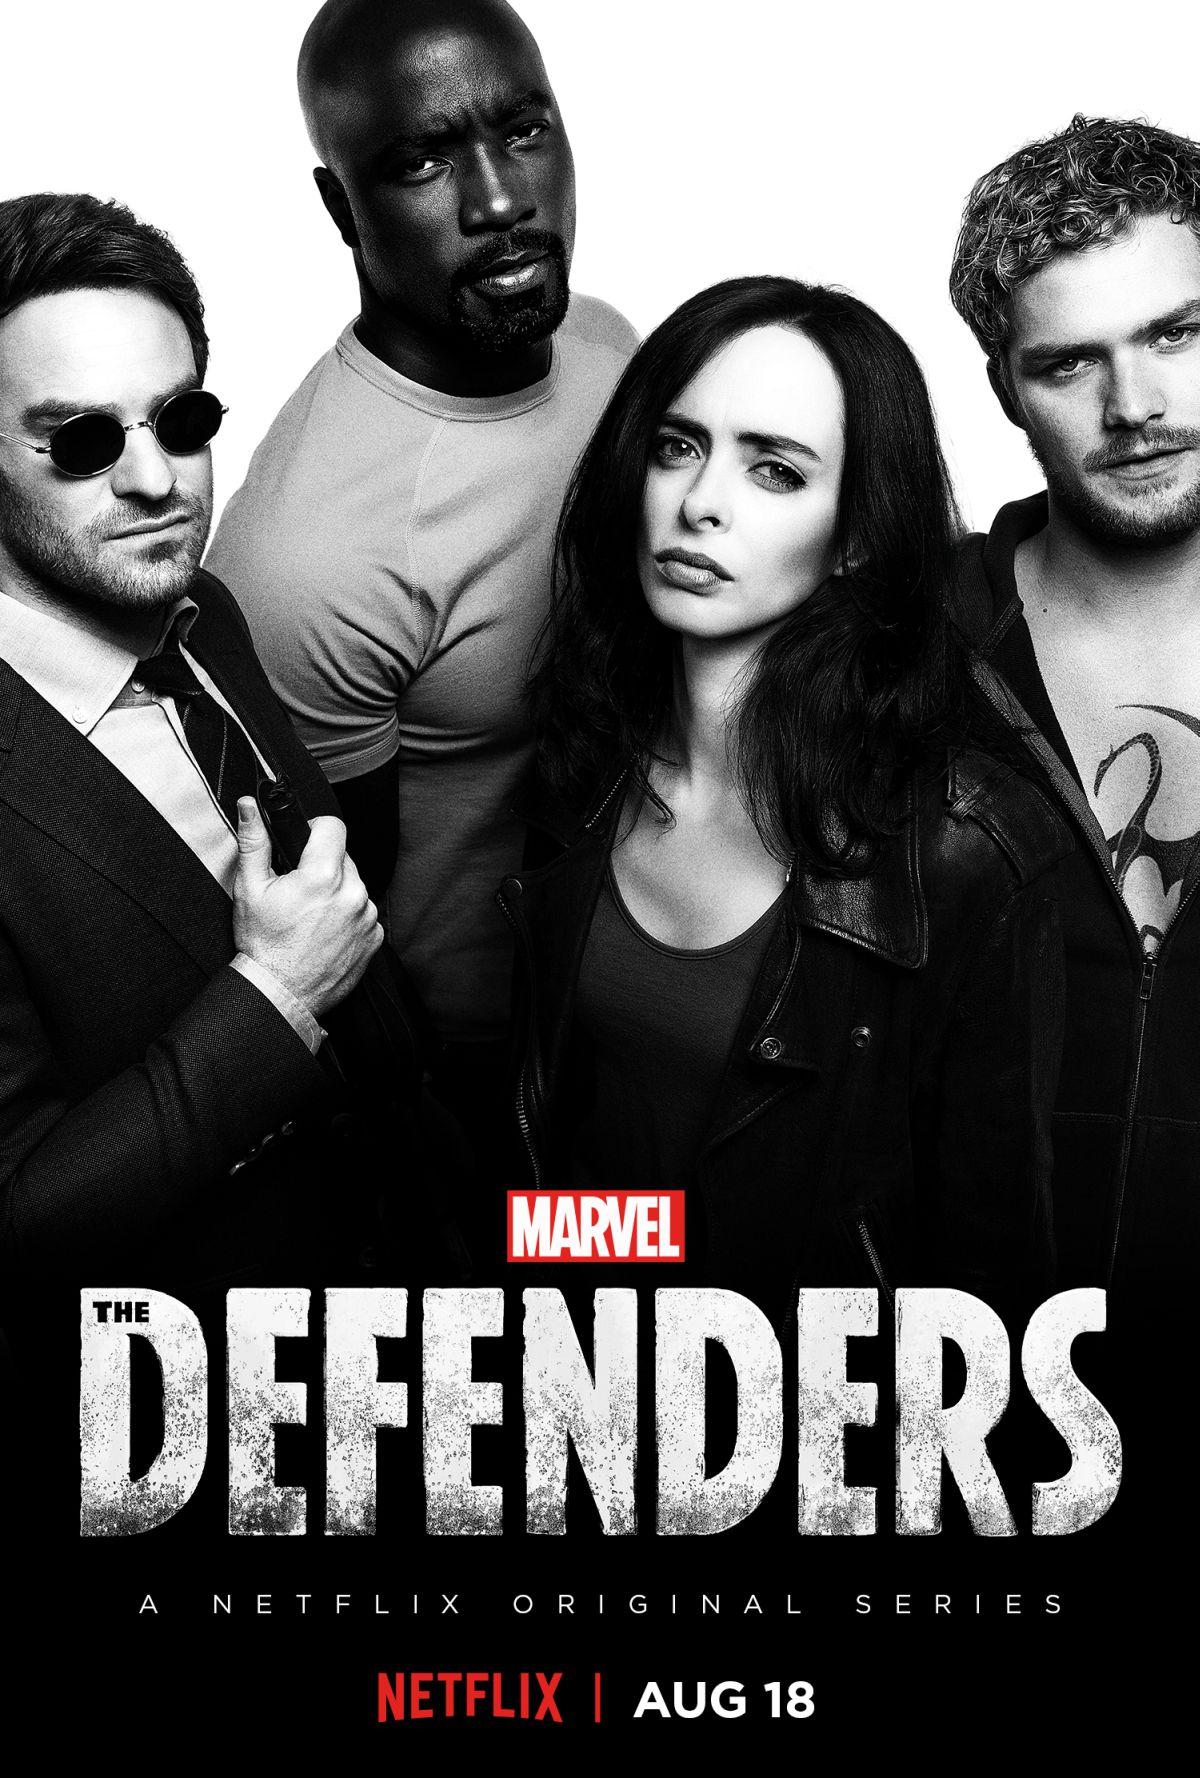 Marvels The Defenders Trailer & Poster 2